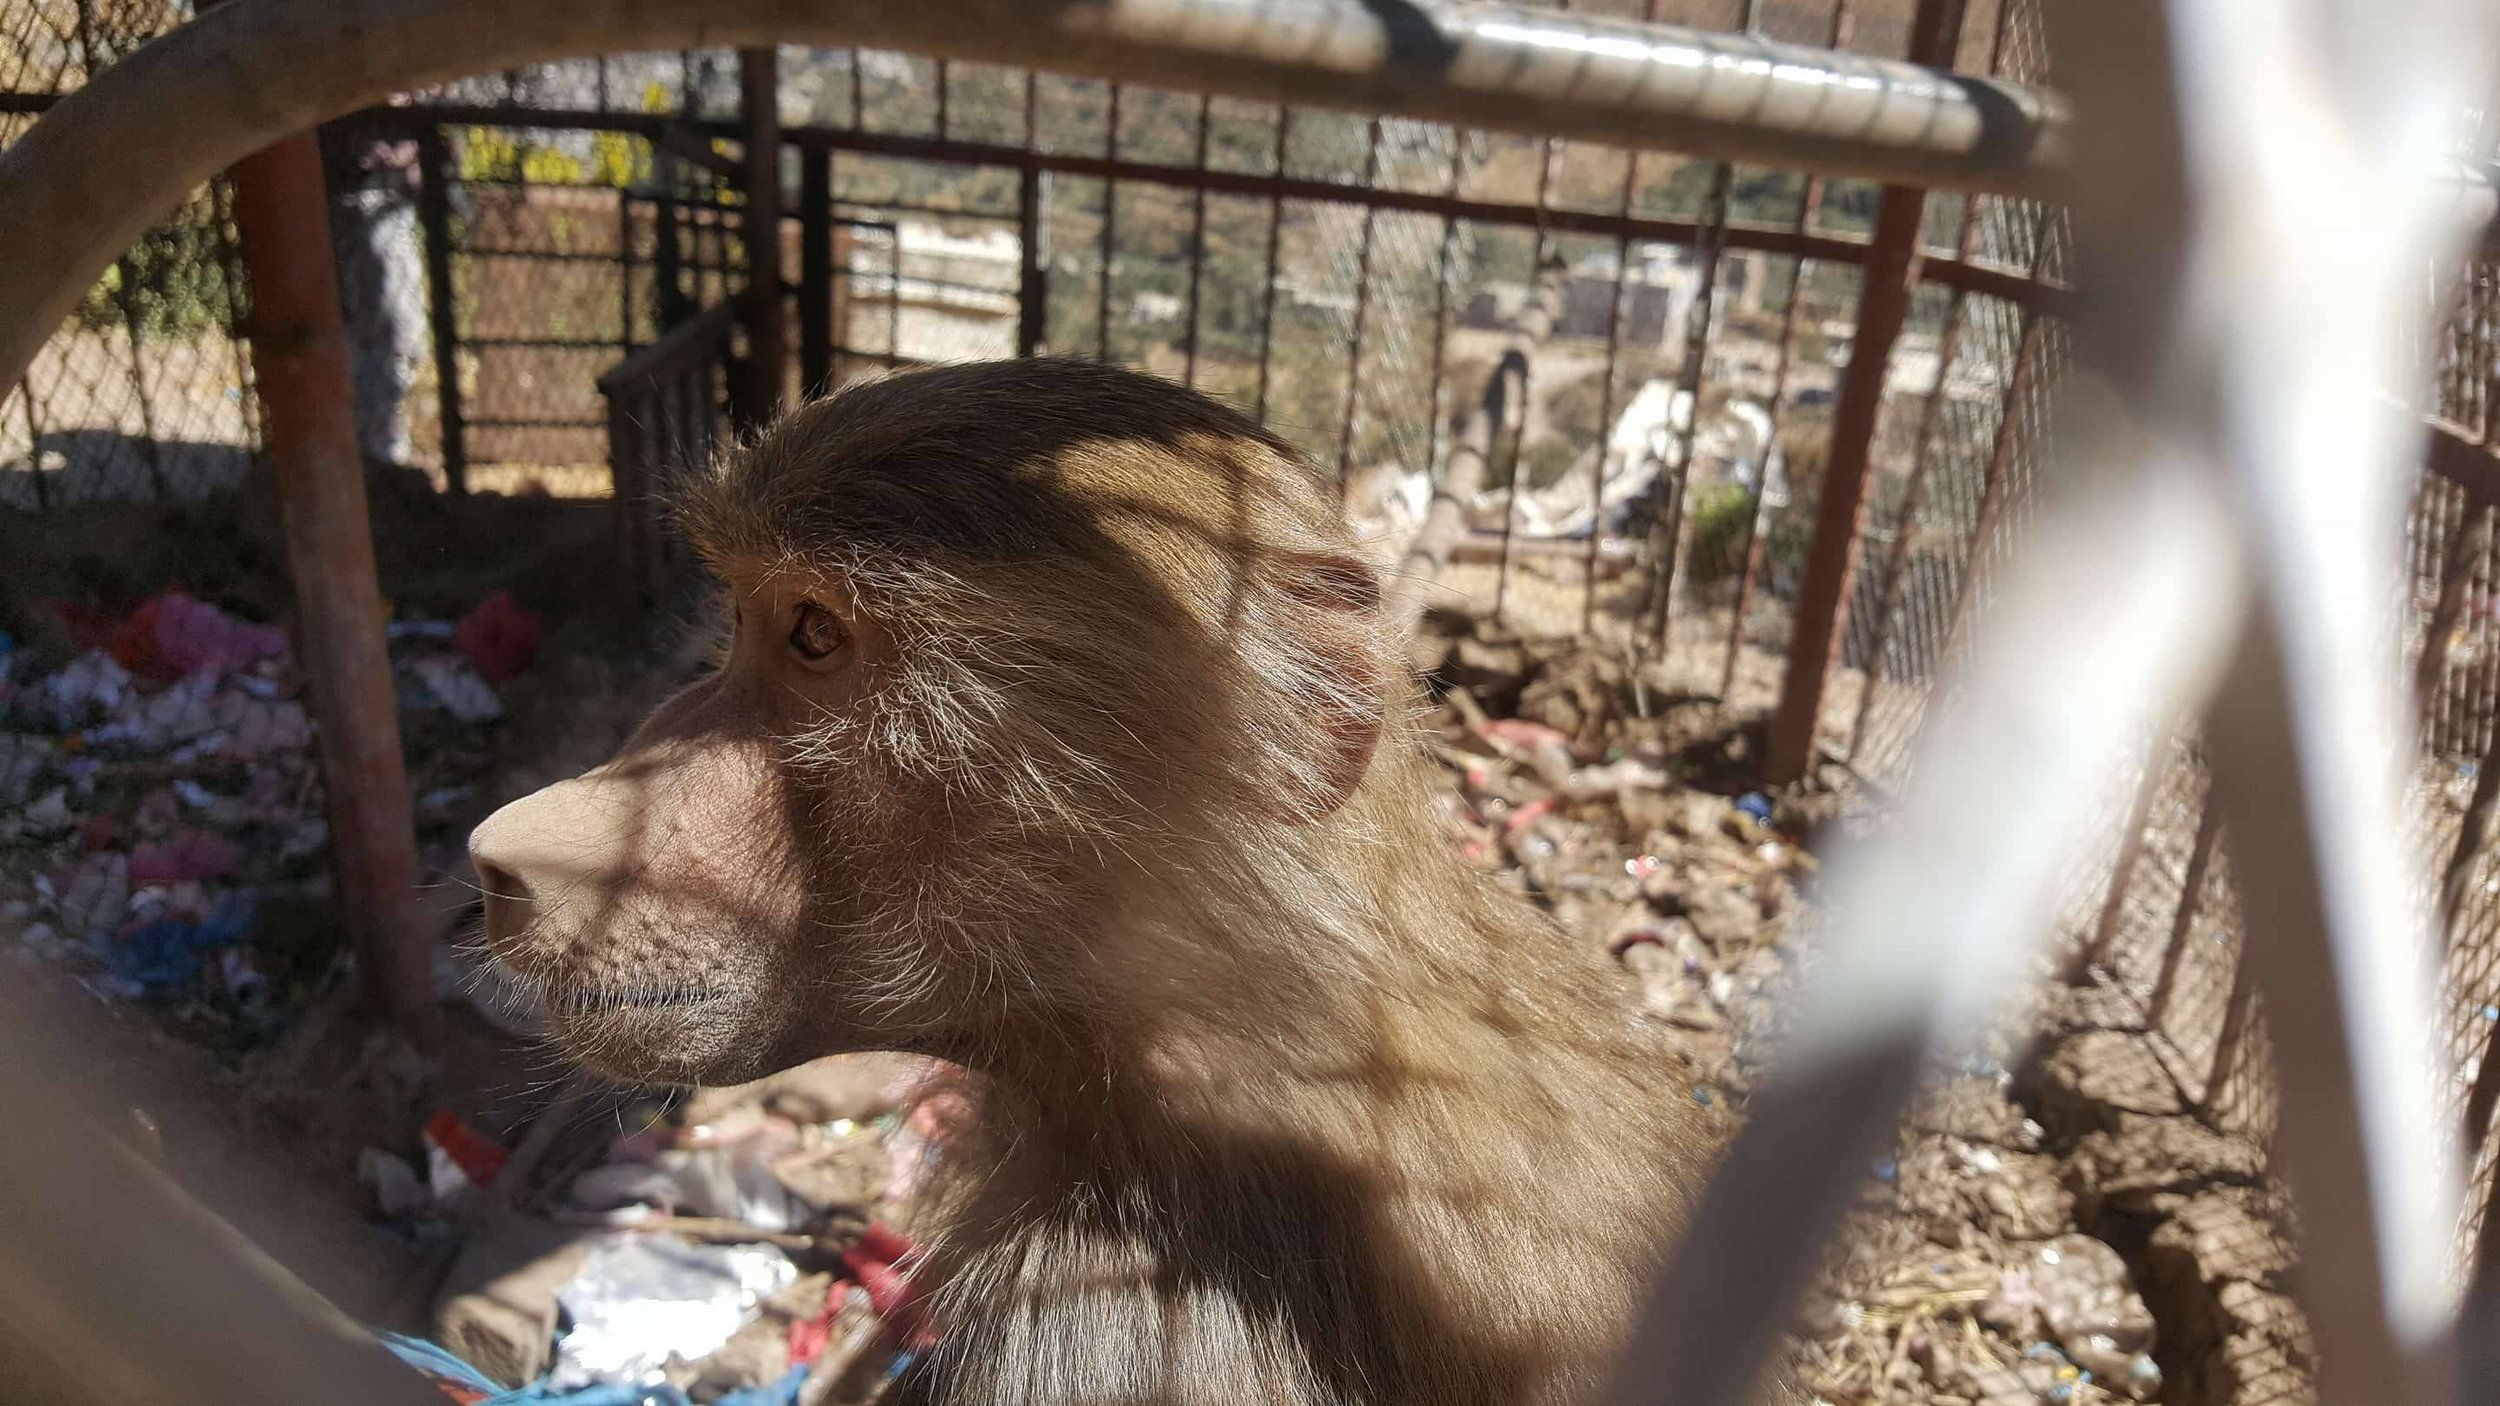 ibb zoo baboon 20 DEC 2017 salman al hadi pic OWAP AR.jpg